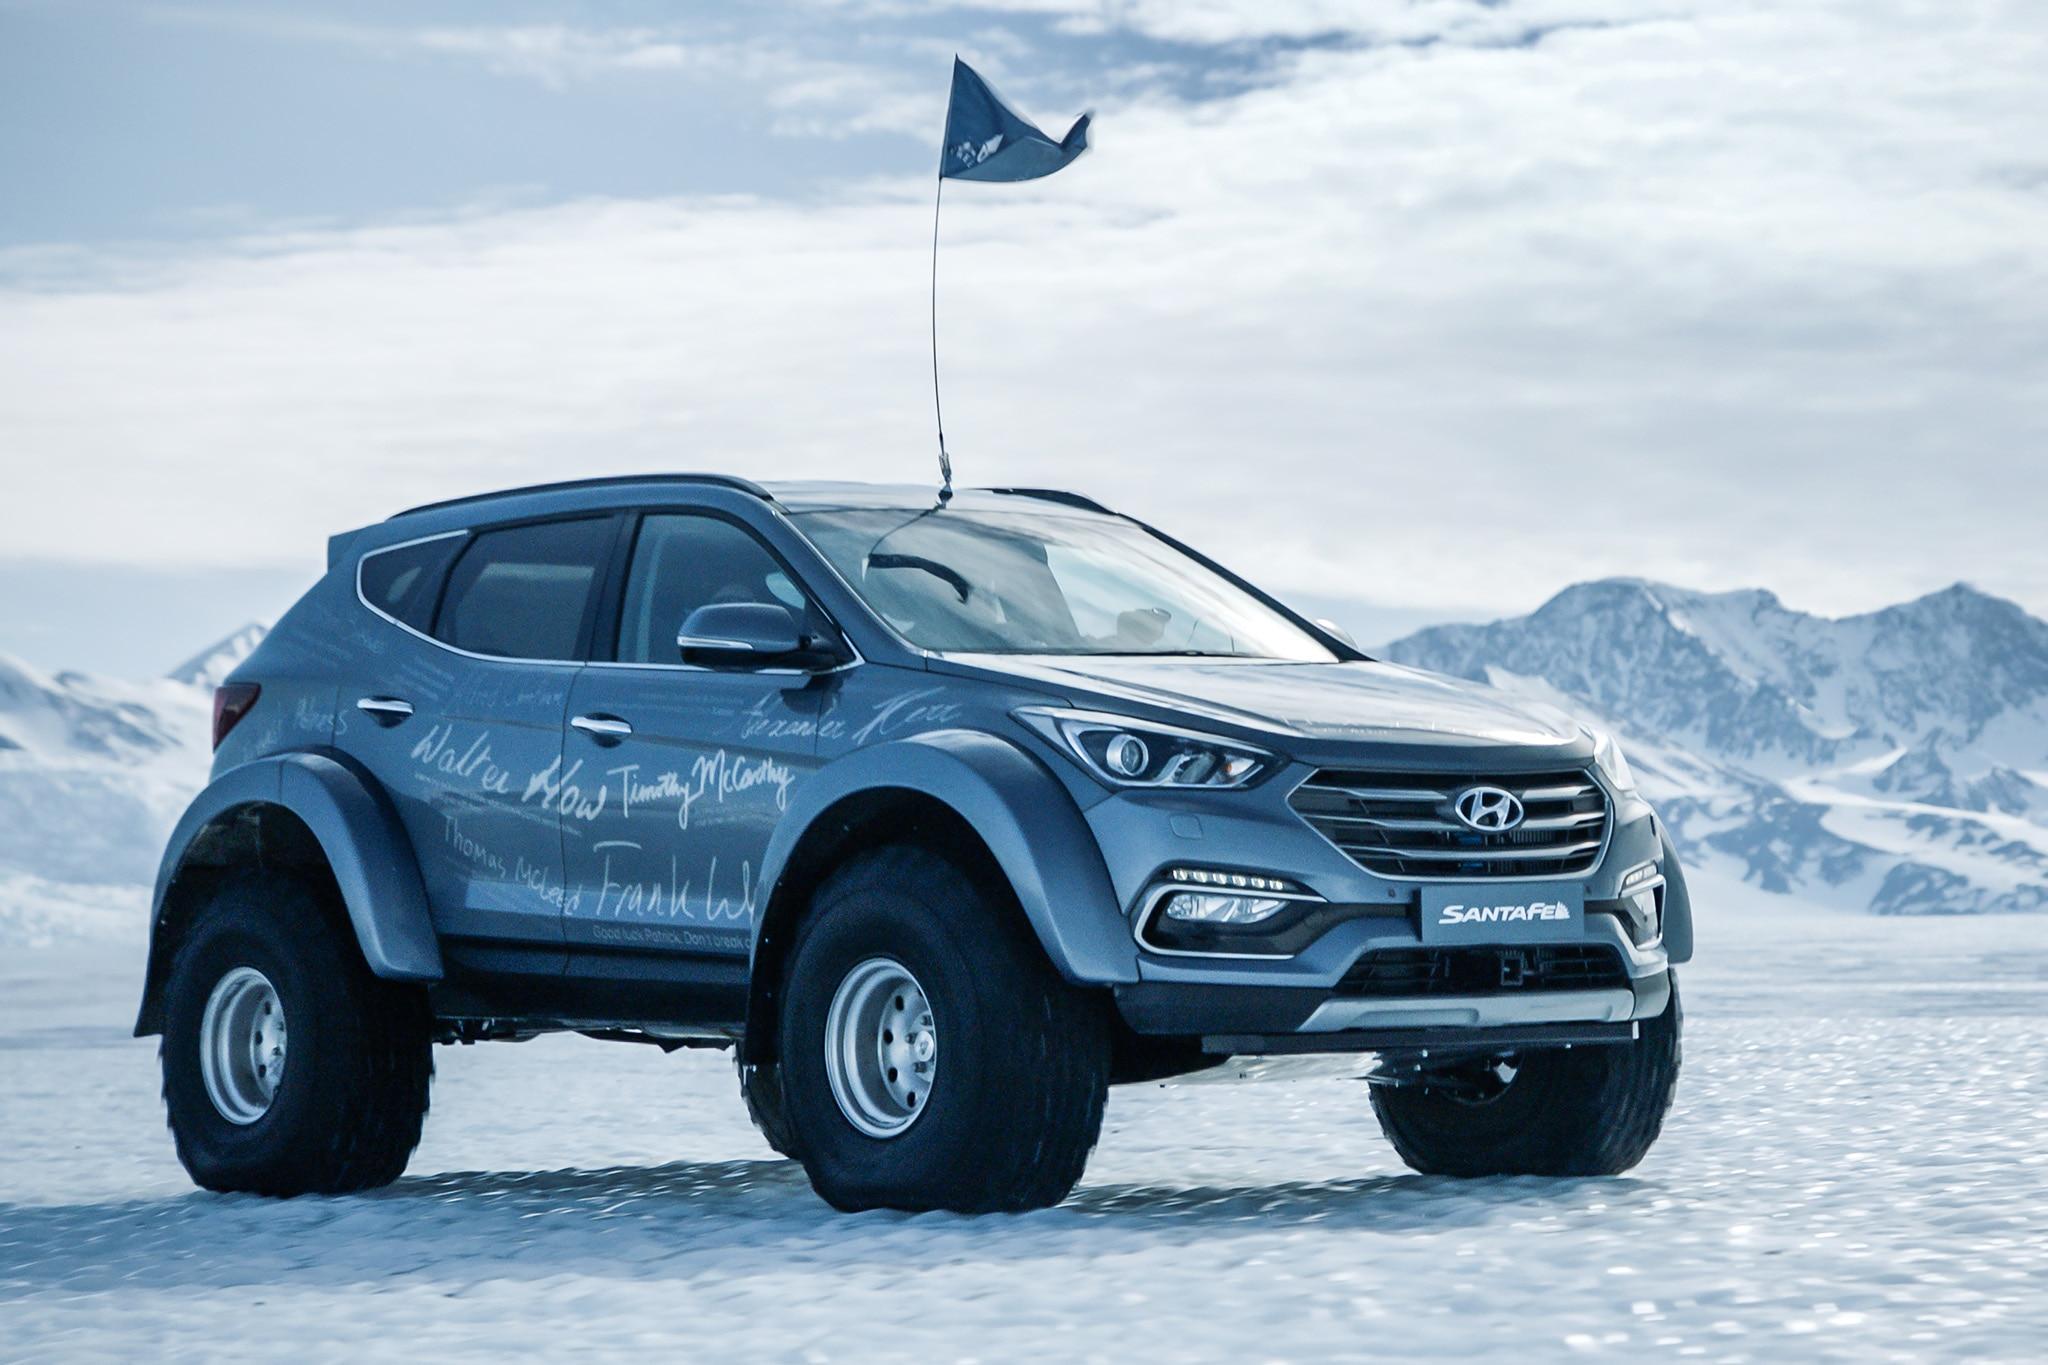 2016 Hyundai Santa Fe >> Ernest Shackleton's Great Grandson Completes Antarctica Quest in a Hyundai Santa Fe | Automobile ...